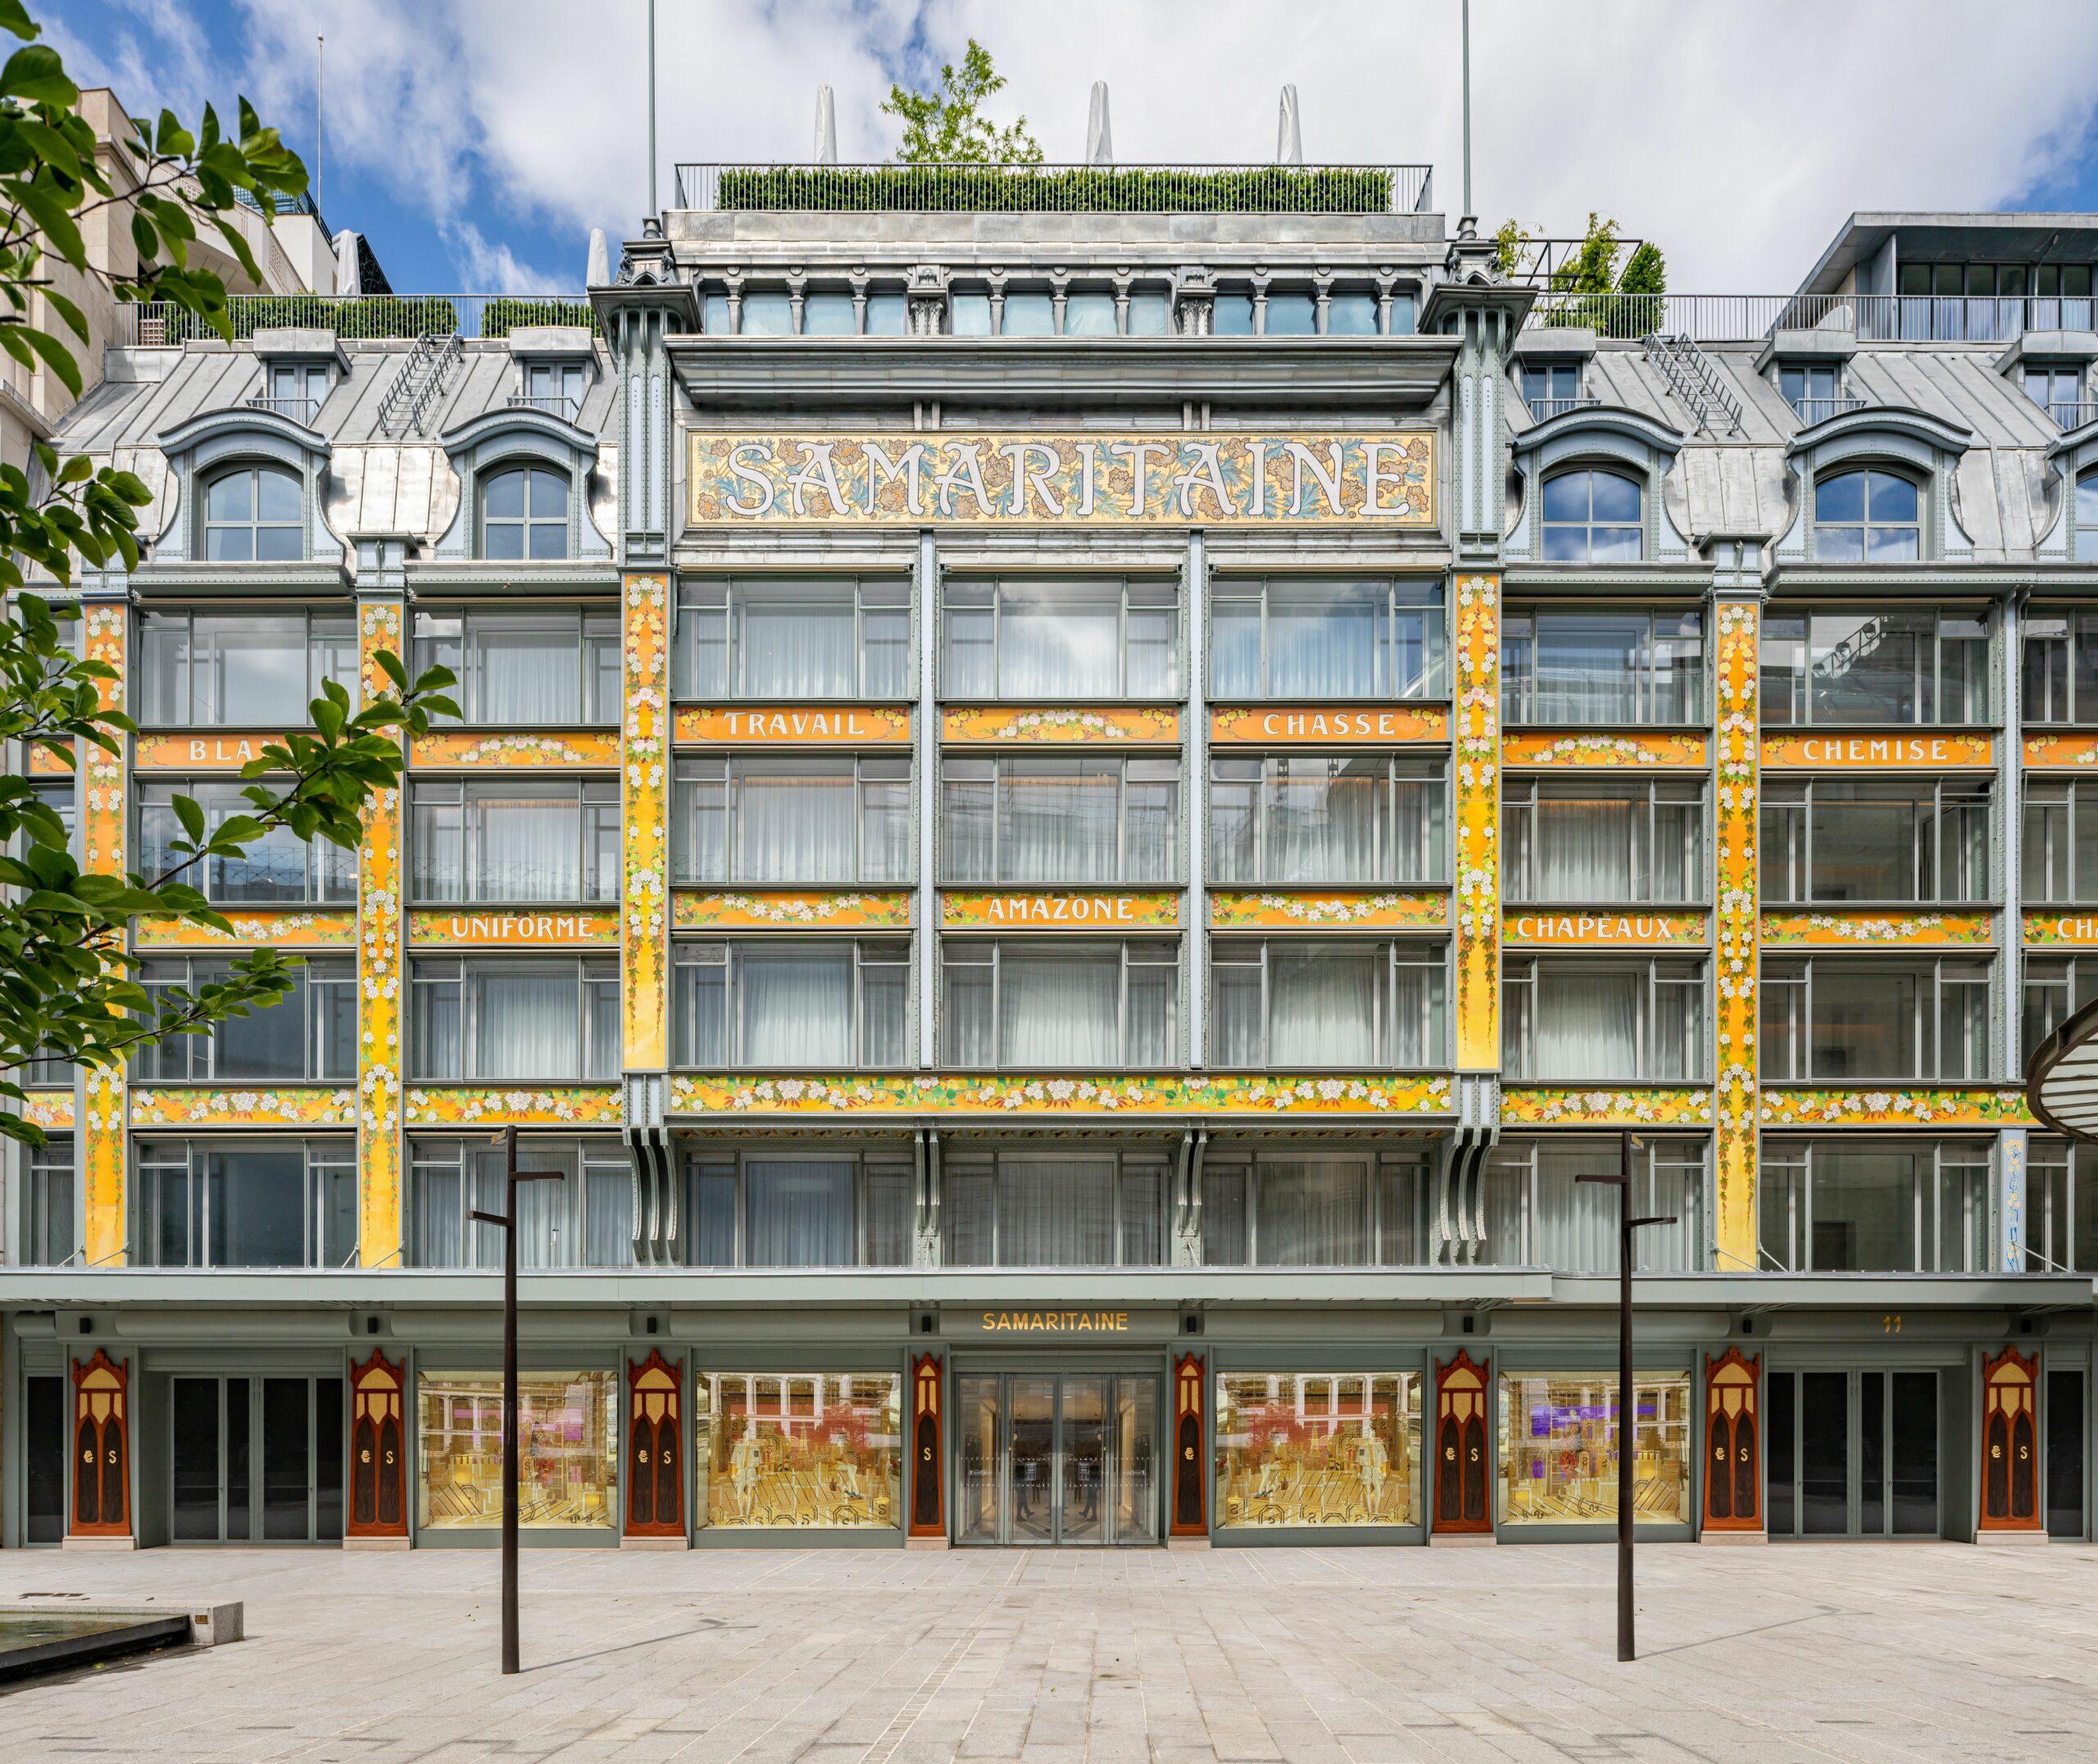 Obchodný dom La Samaritaine, fasáda. ©WeAreContent